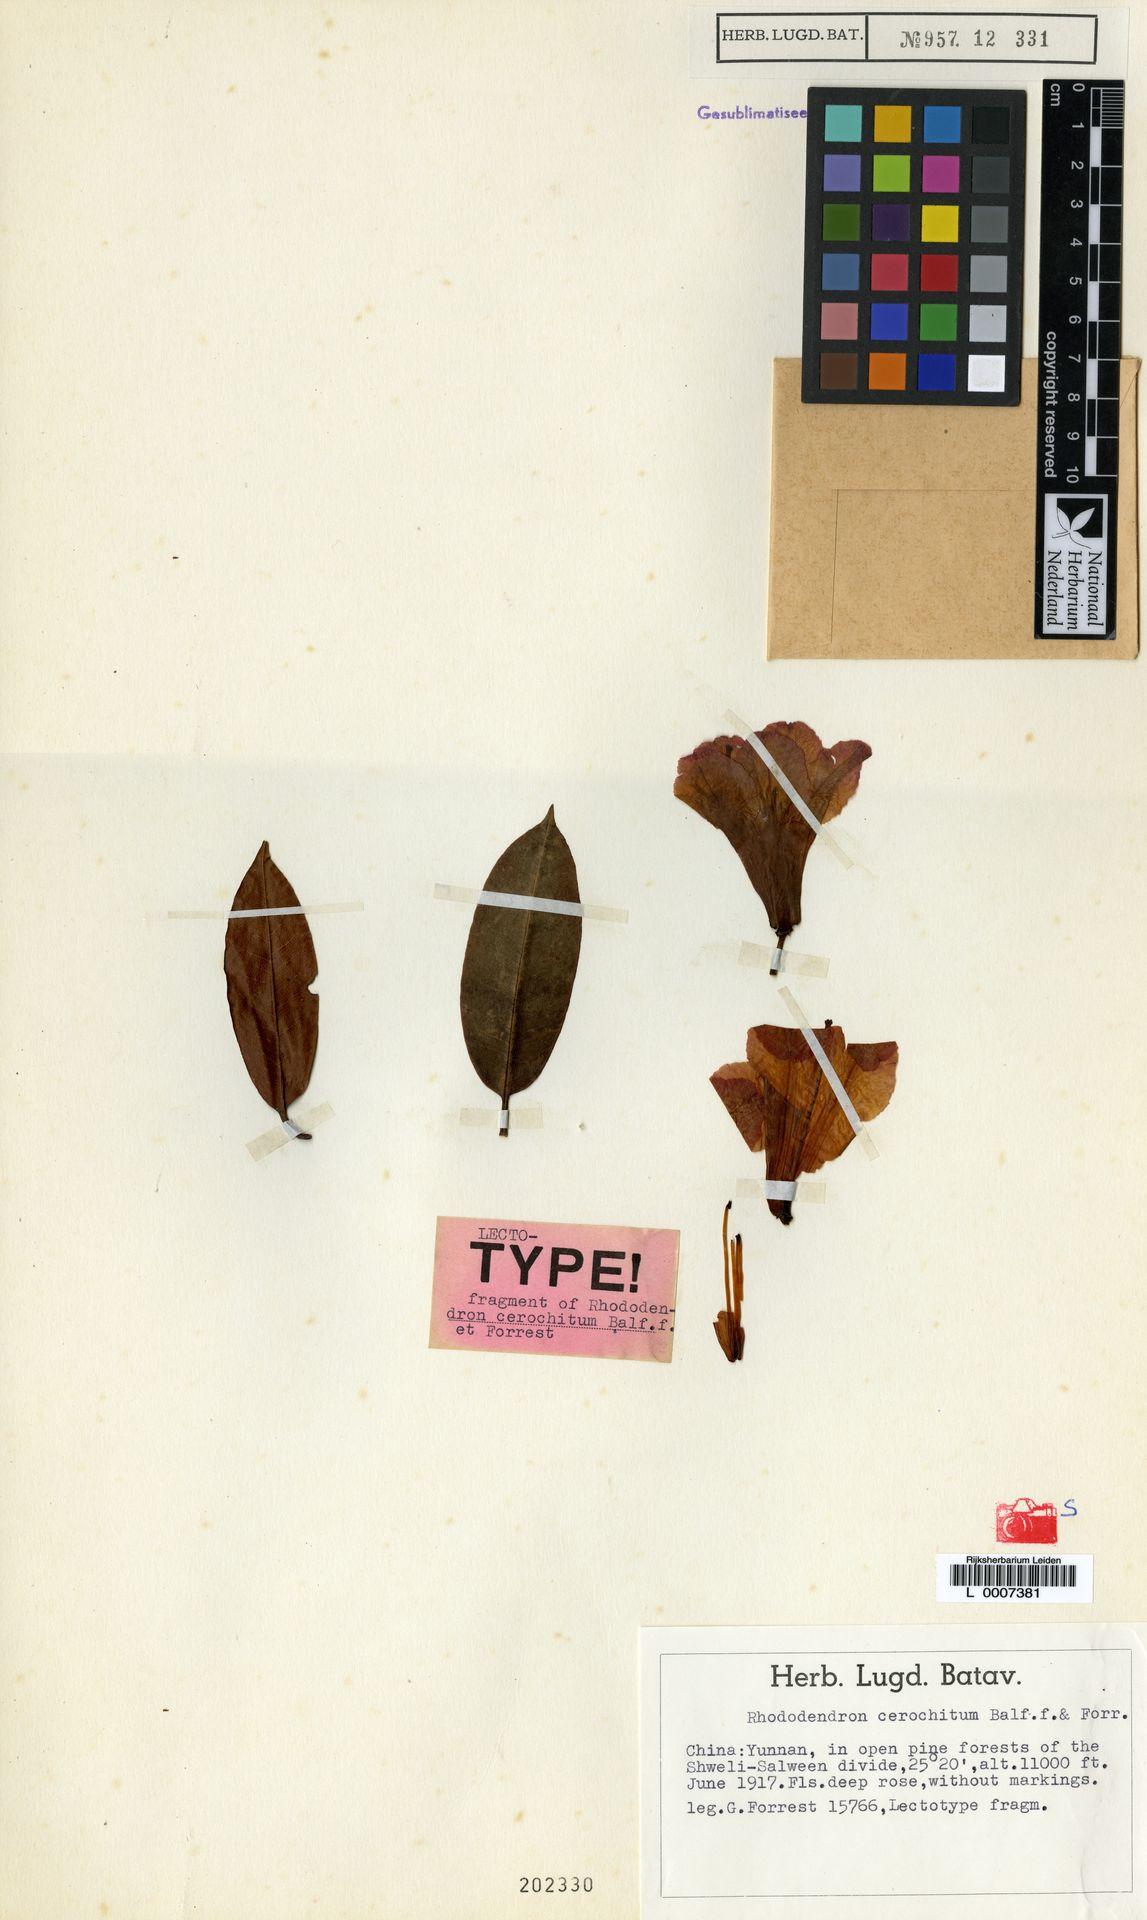 L  0007381 | Rhododendron cerochitum Balf.f. & Forrest